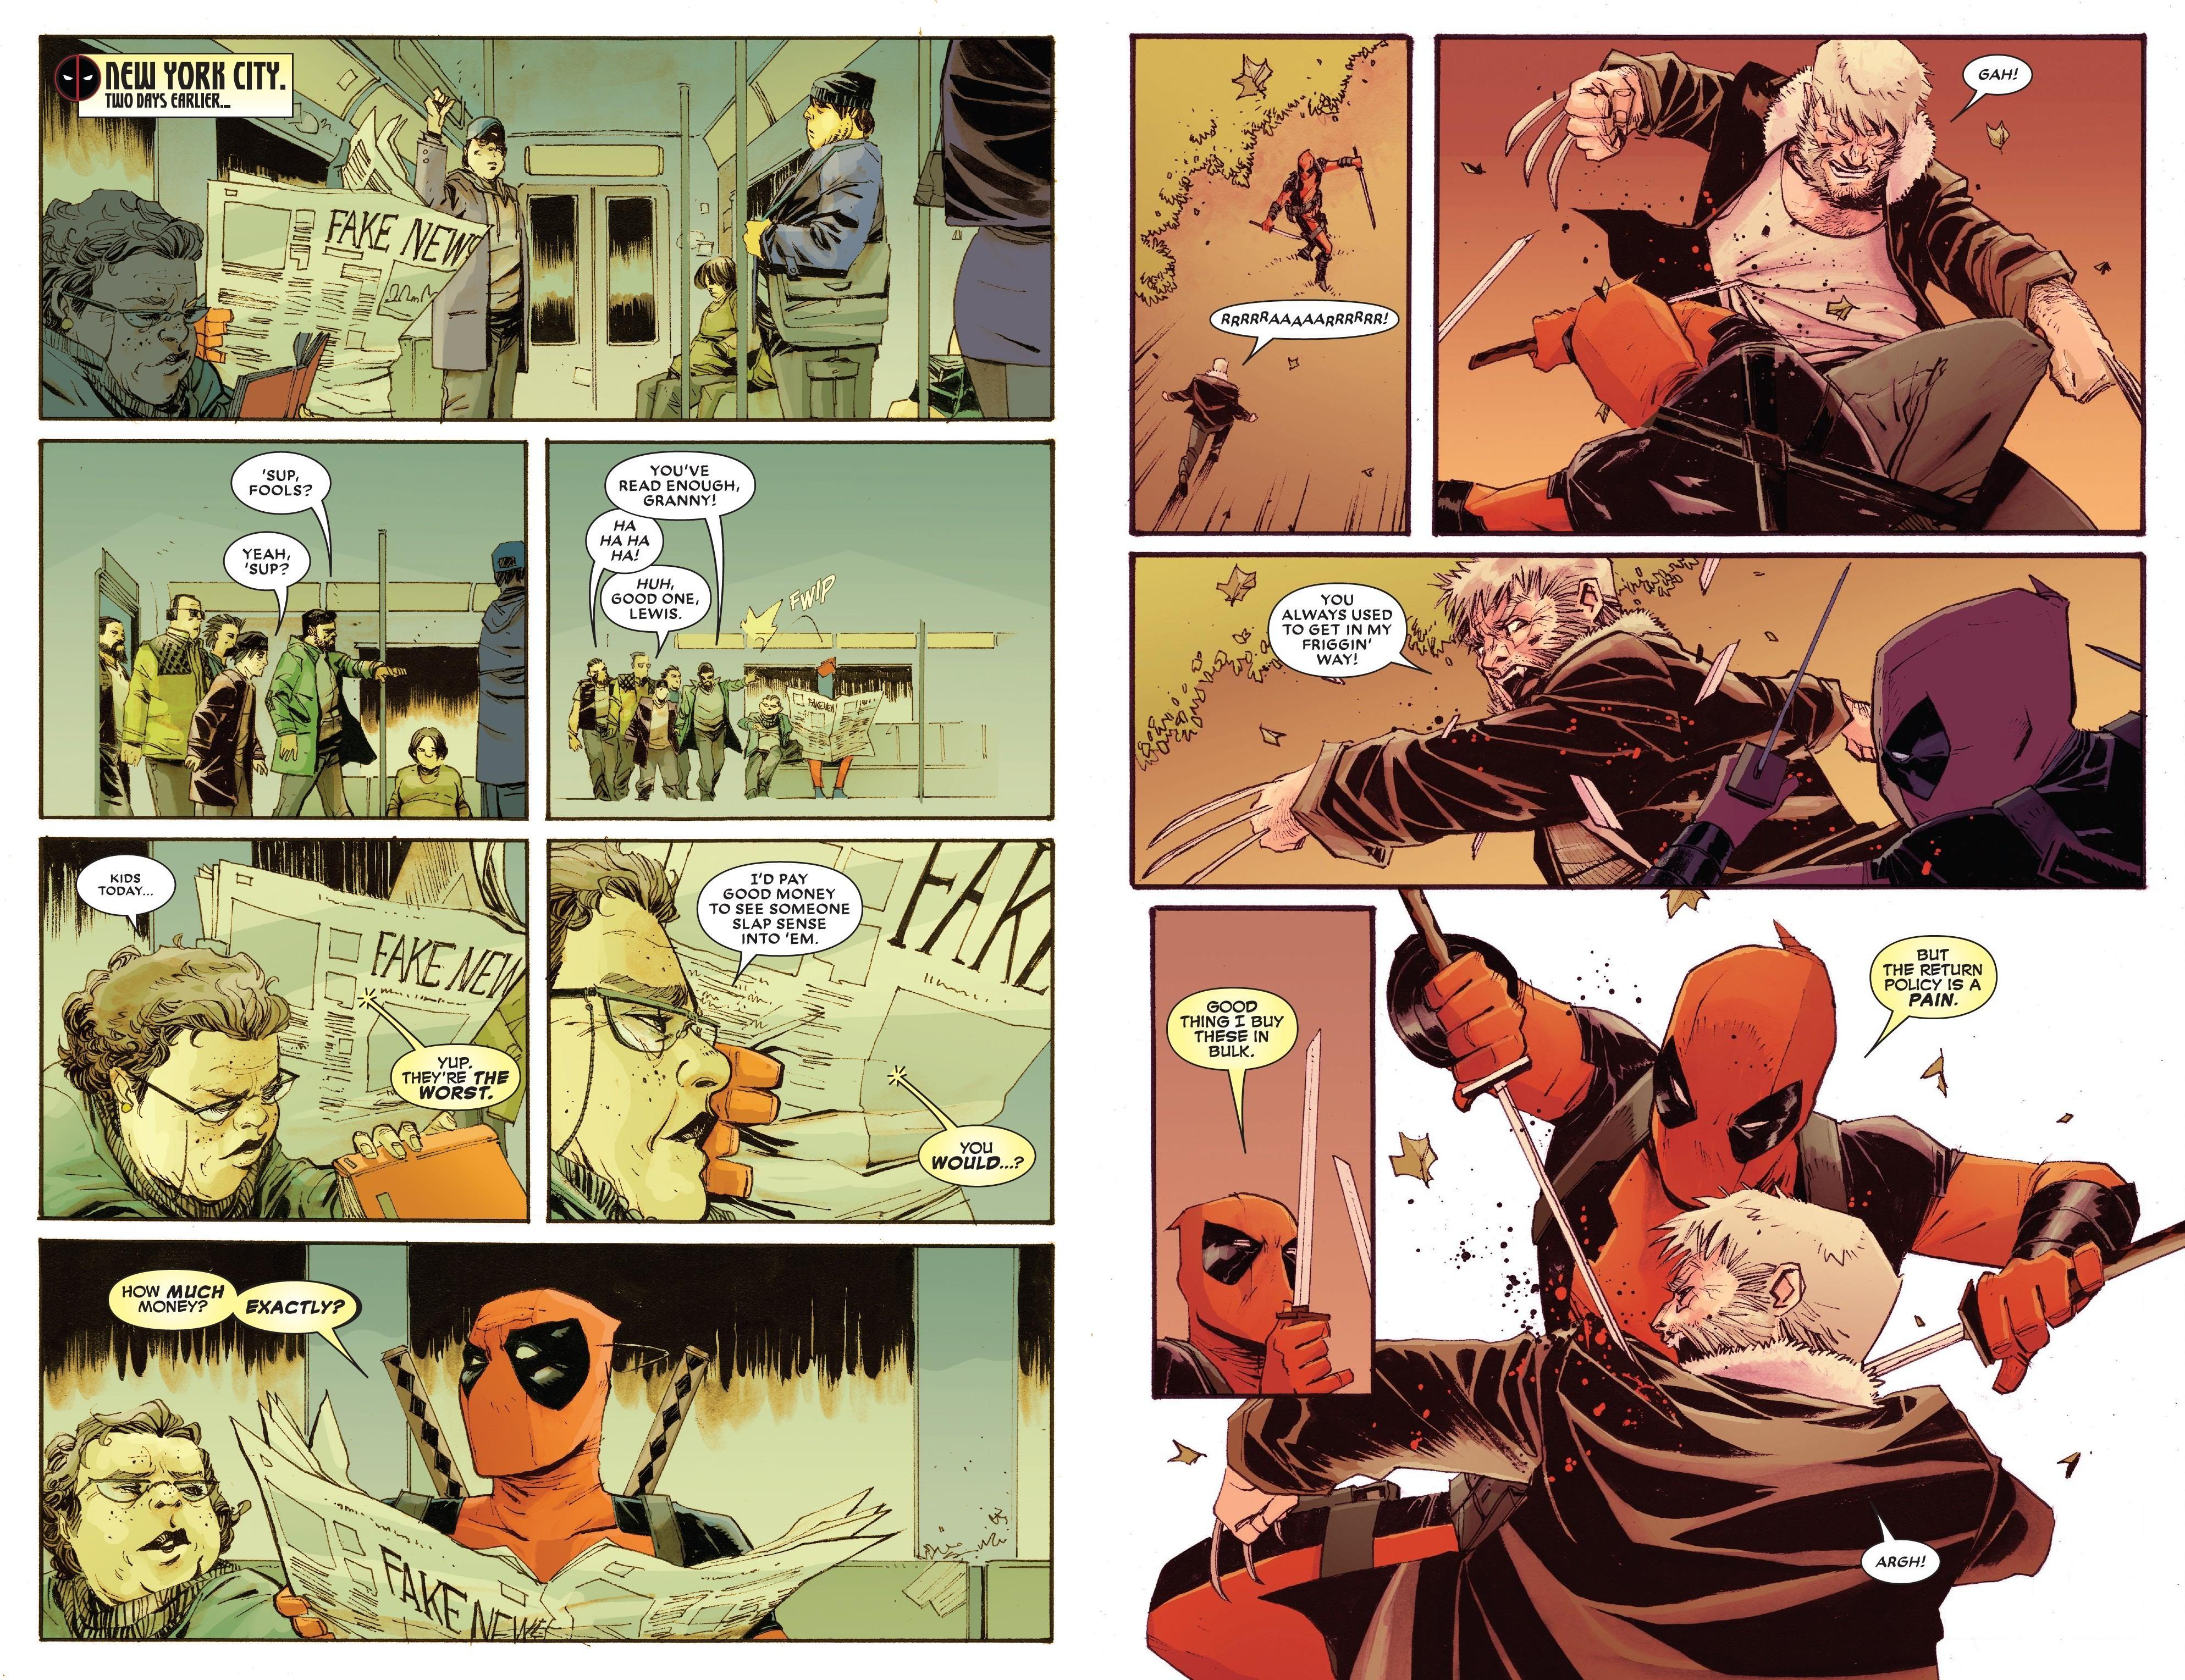 Deadpool vs. Old Man Logan review